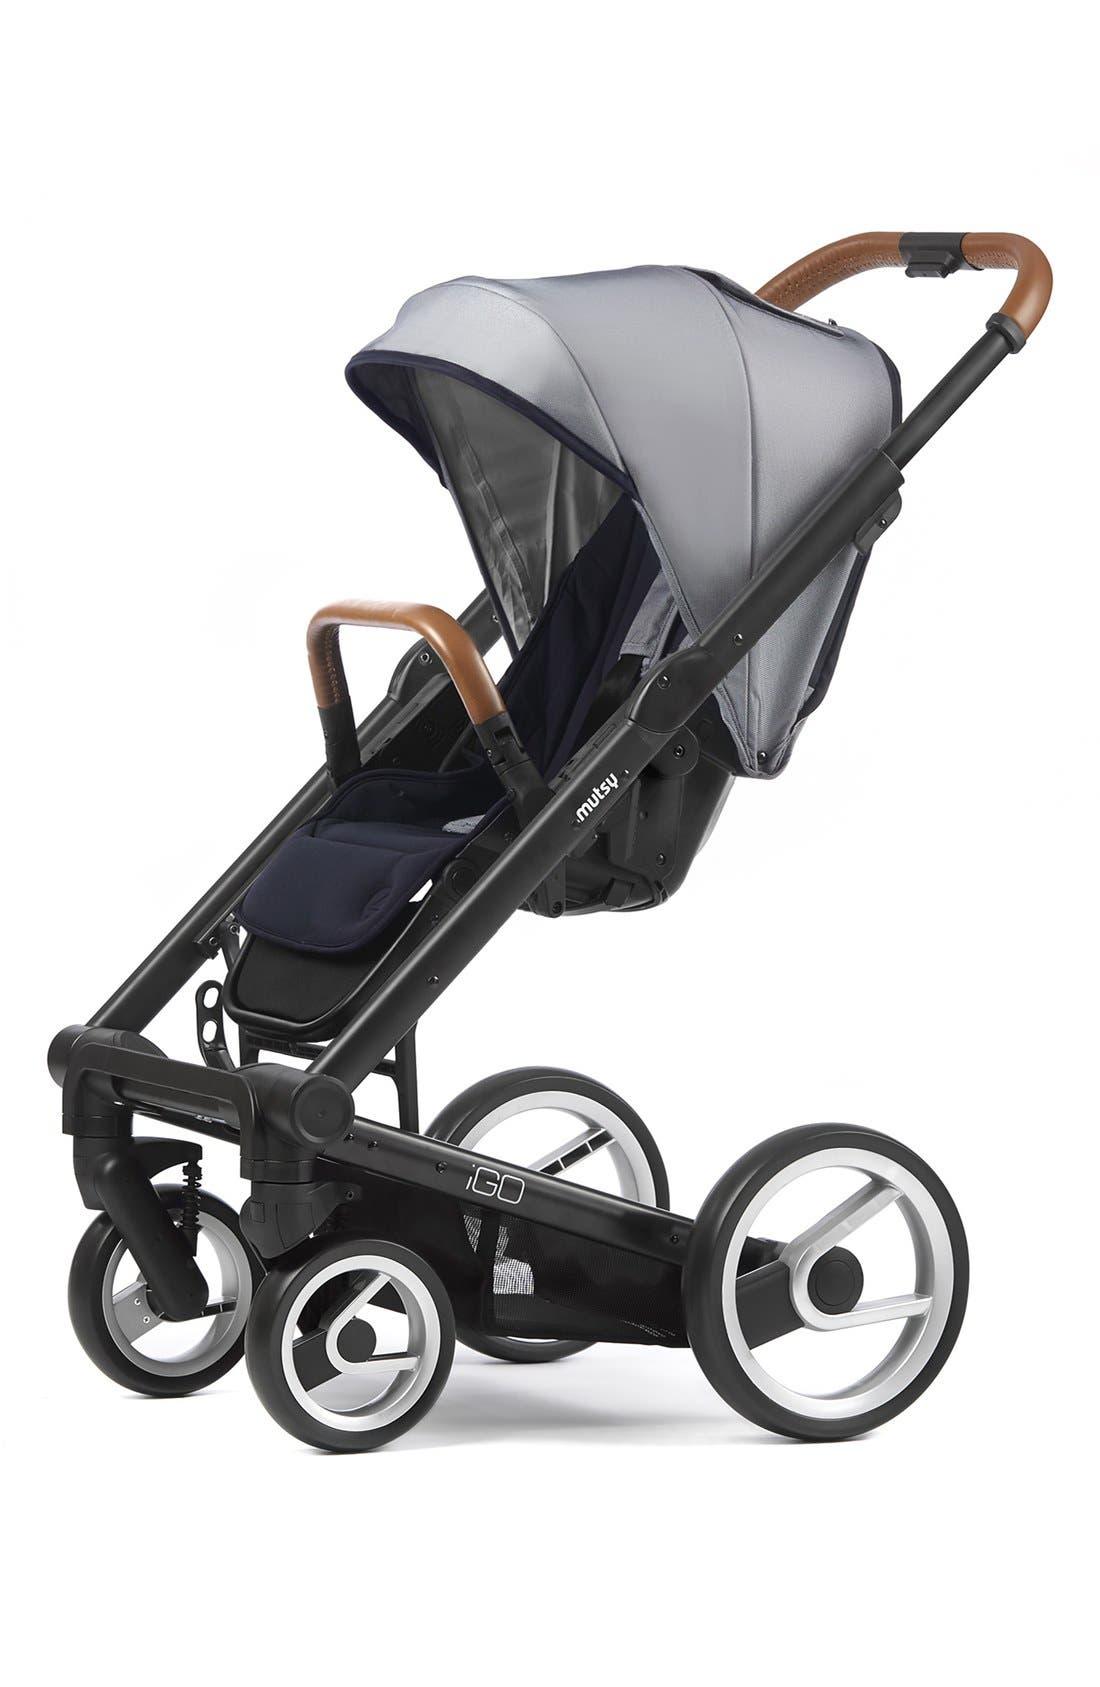 Igo - Urban Nomad Stroller,                             Alternate thumbnail 2, color,                             Black/ White/ Blue